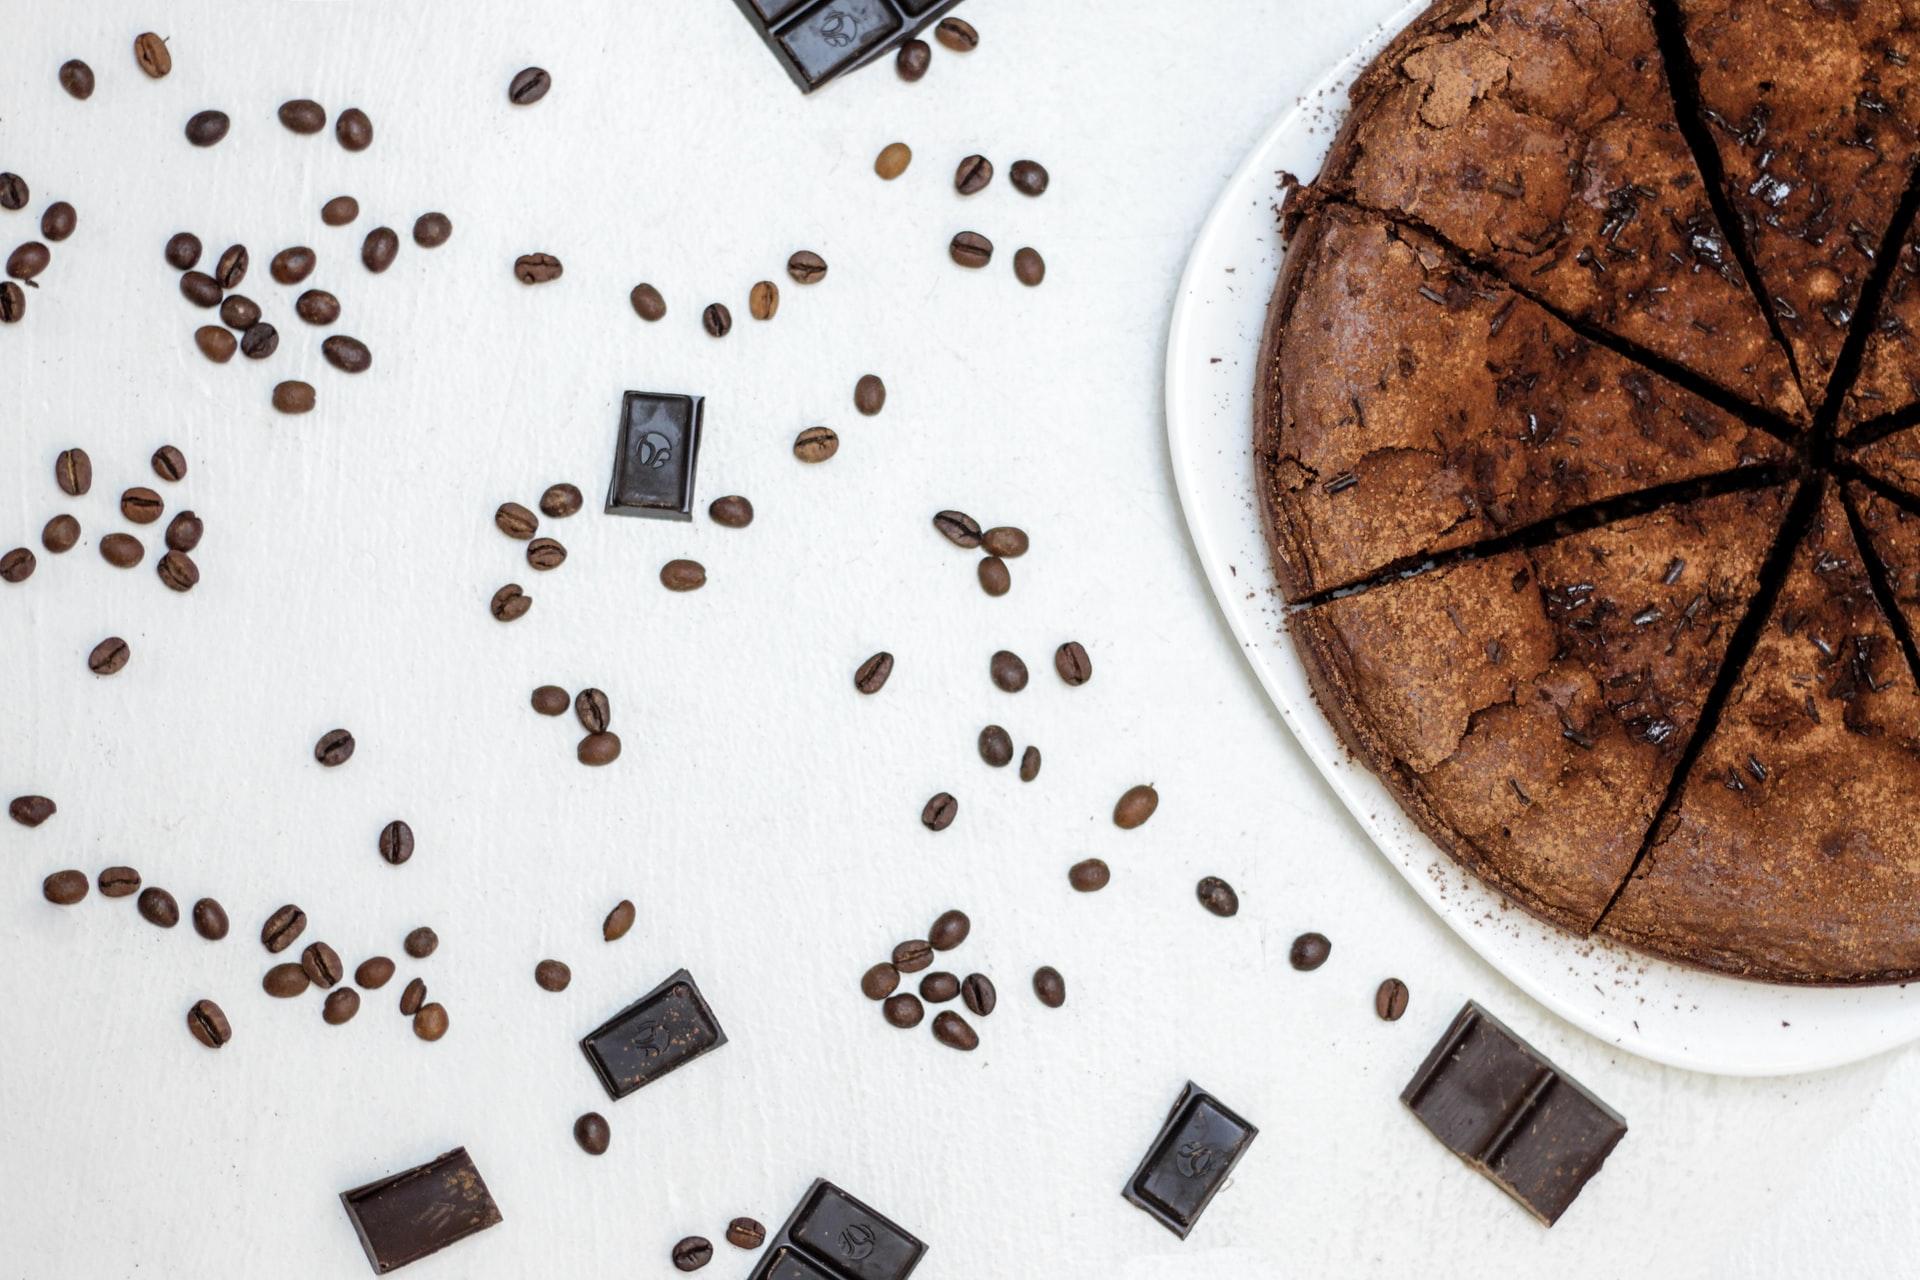 torta 12 cucchiai al caffè